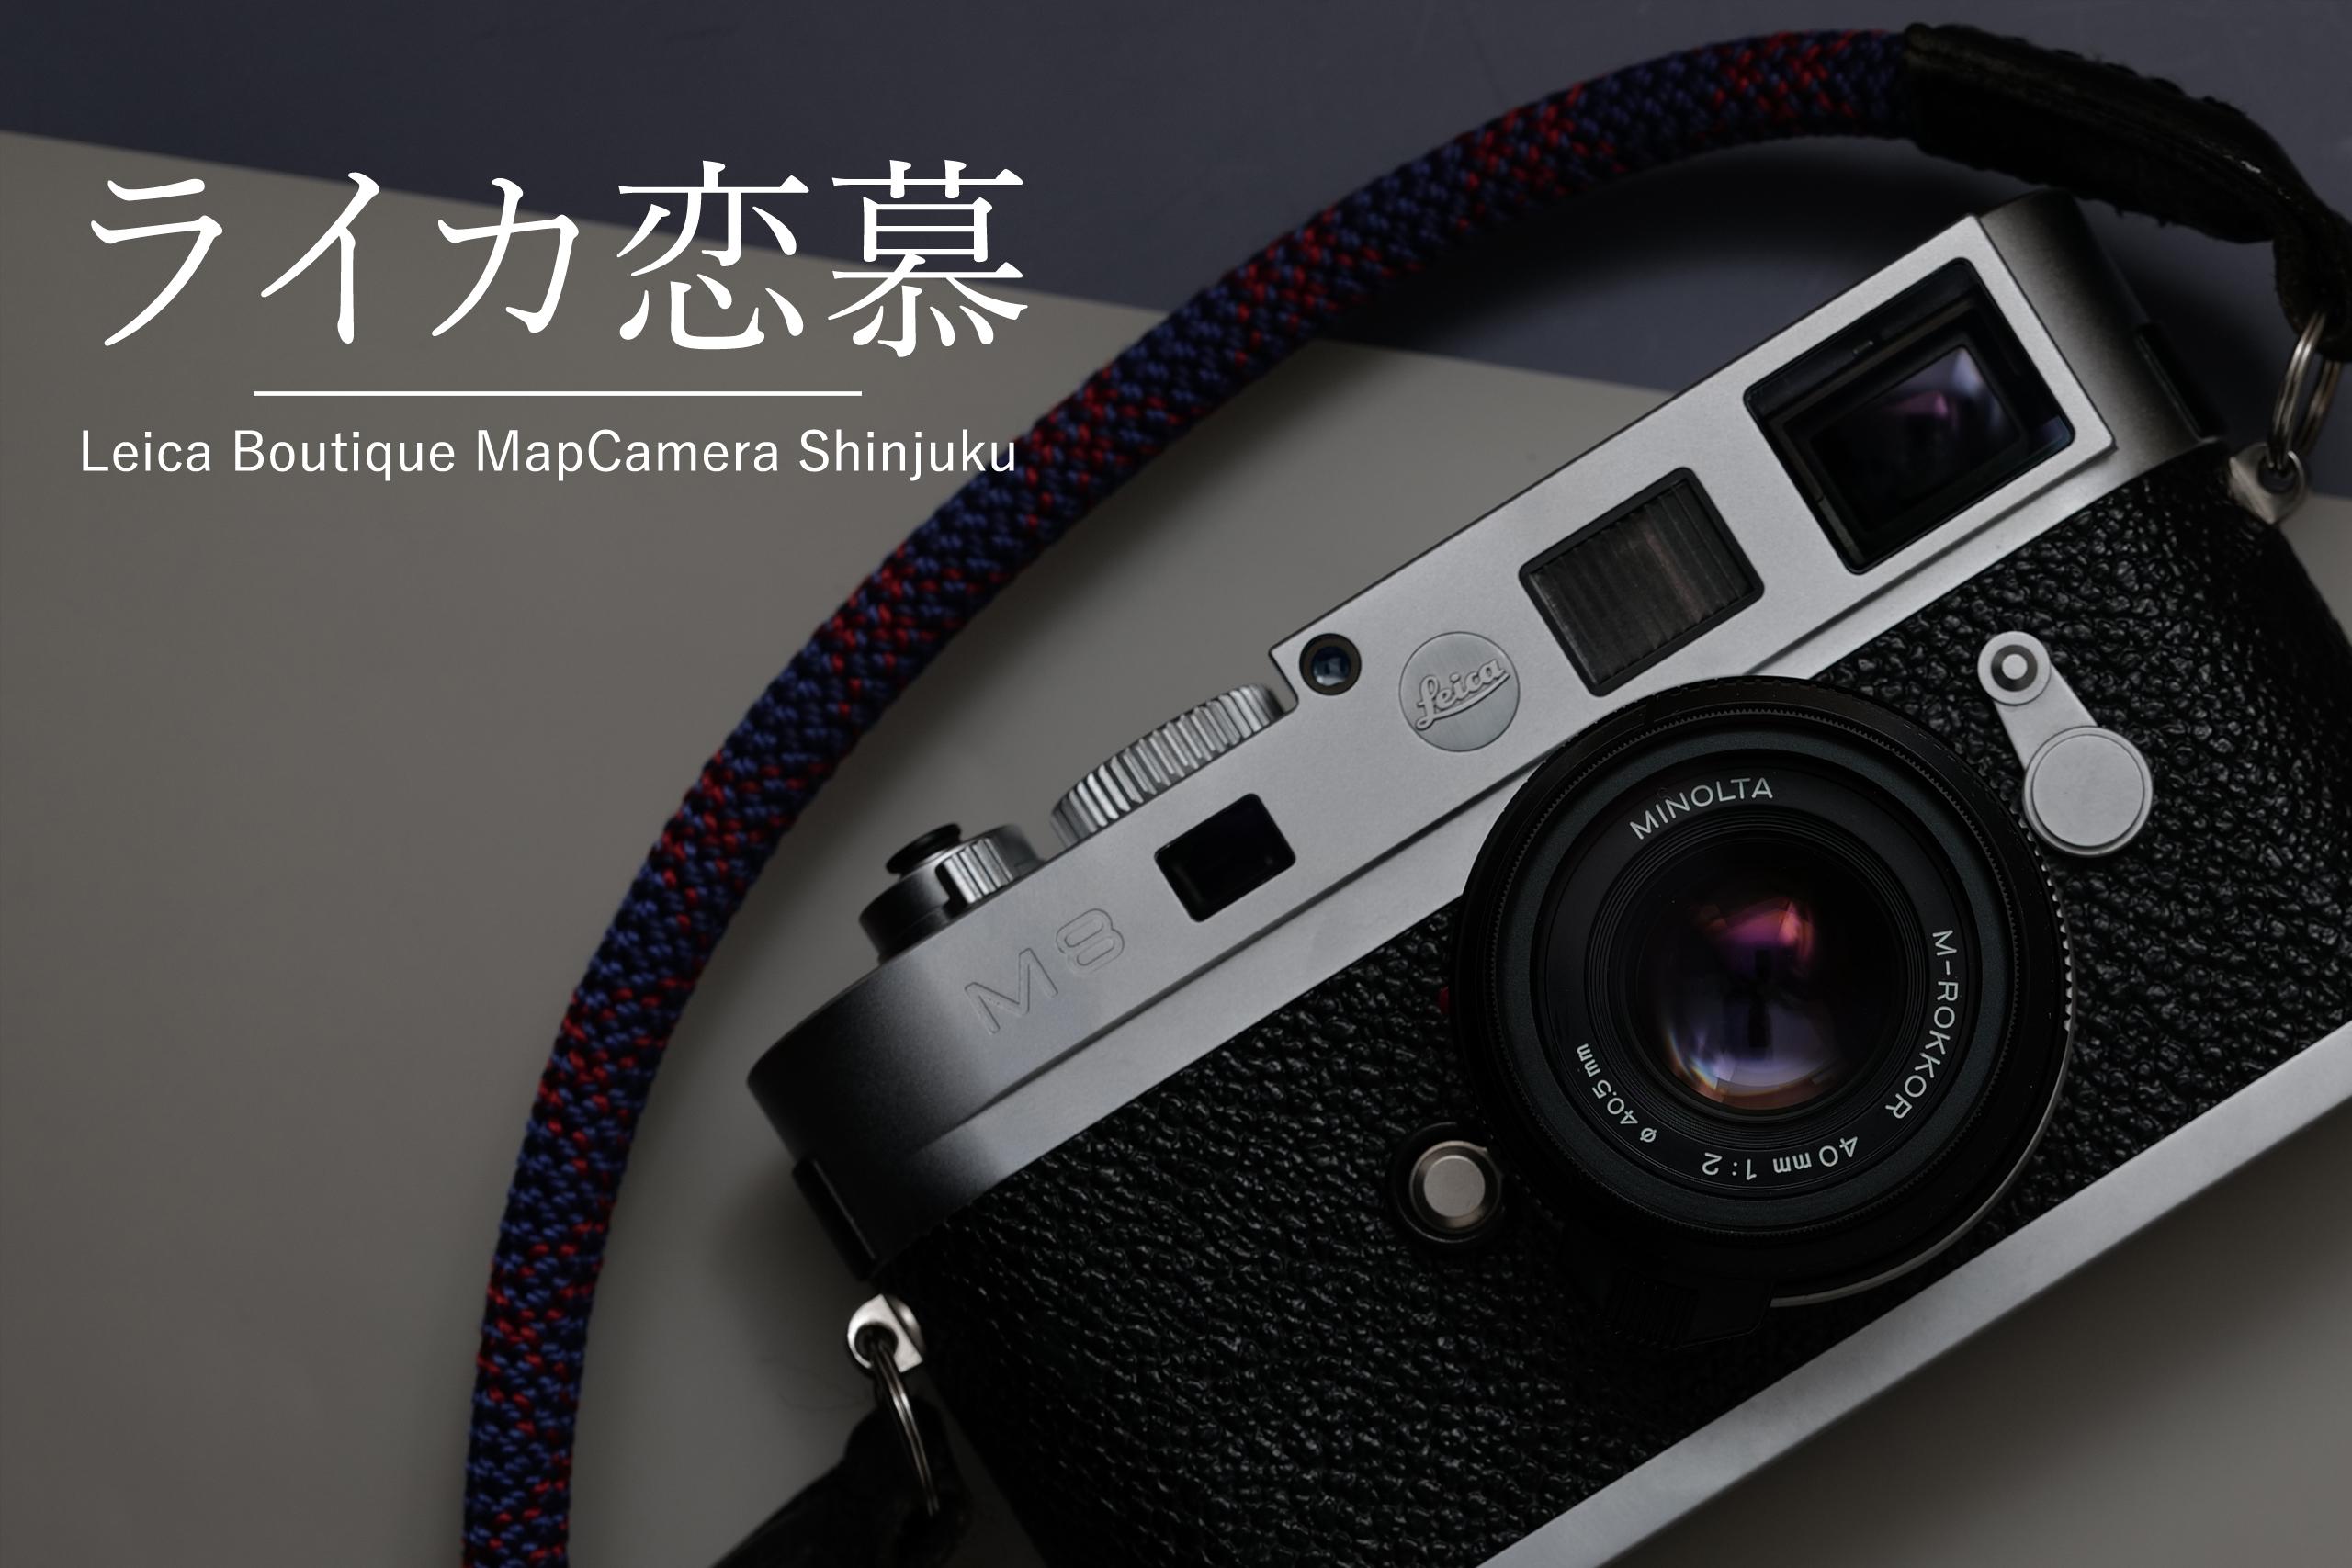 【Leica Boutique MapCamera Shinjuku 8th】私のM6とR6.2愛/M8愛